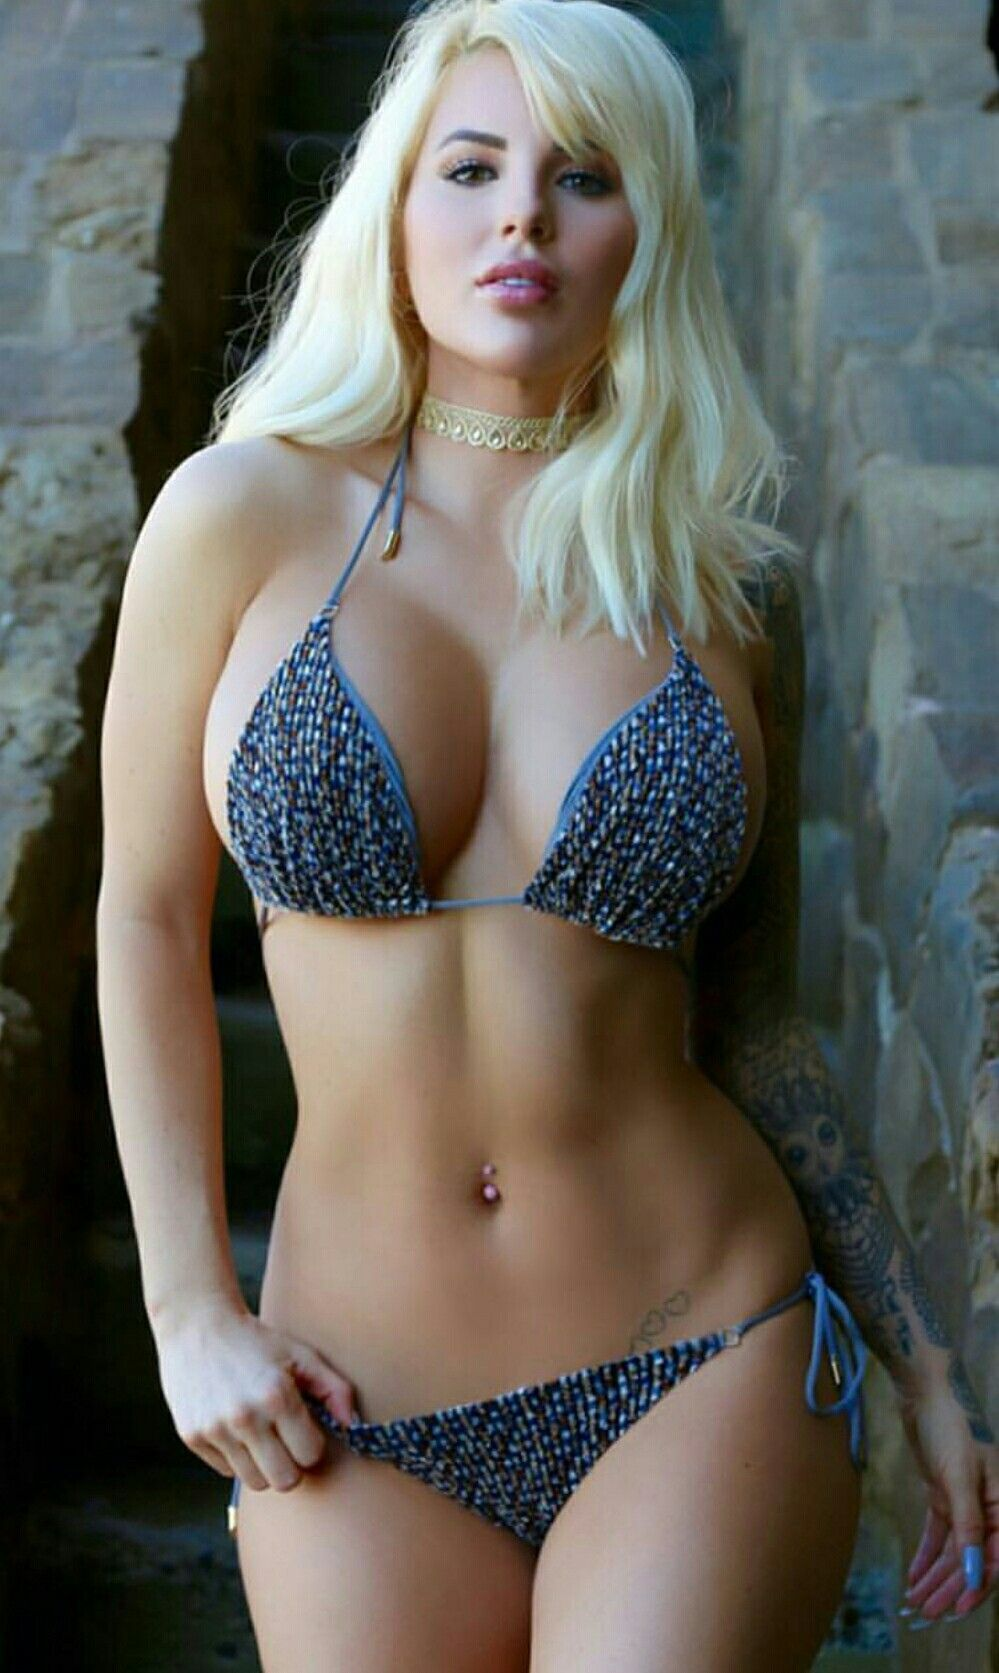 Haut Bikini Bikini Swimsuit Sexy Bikini Bikini Girls Bikini Babes Bikini